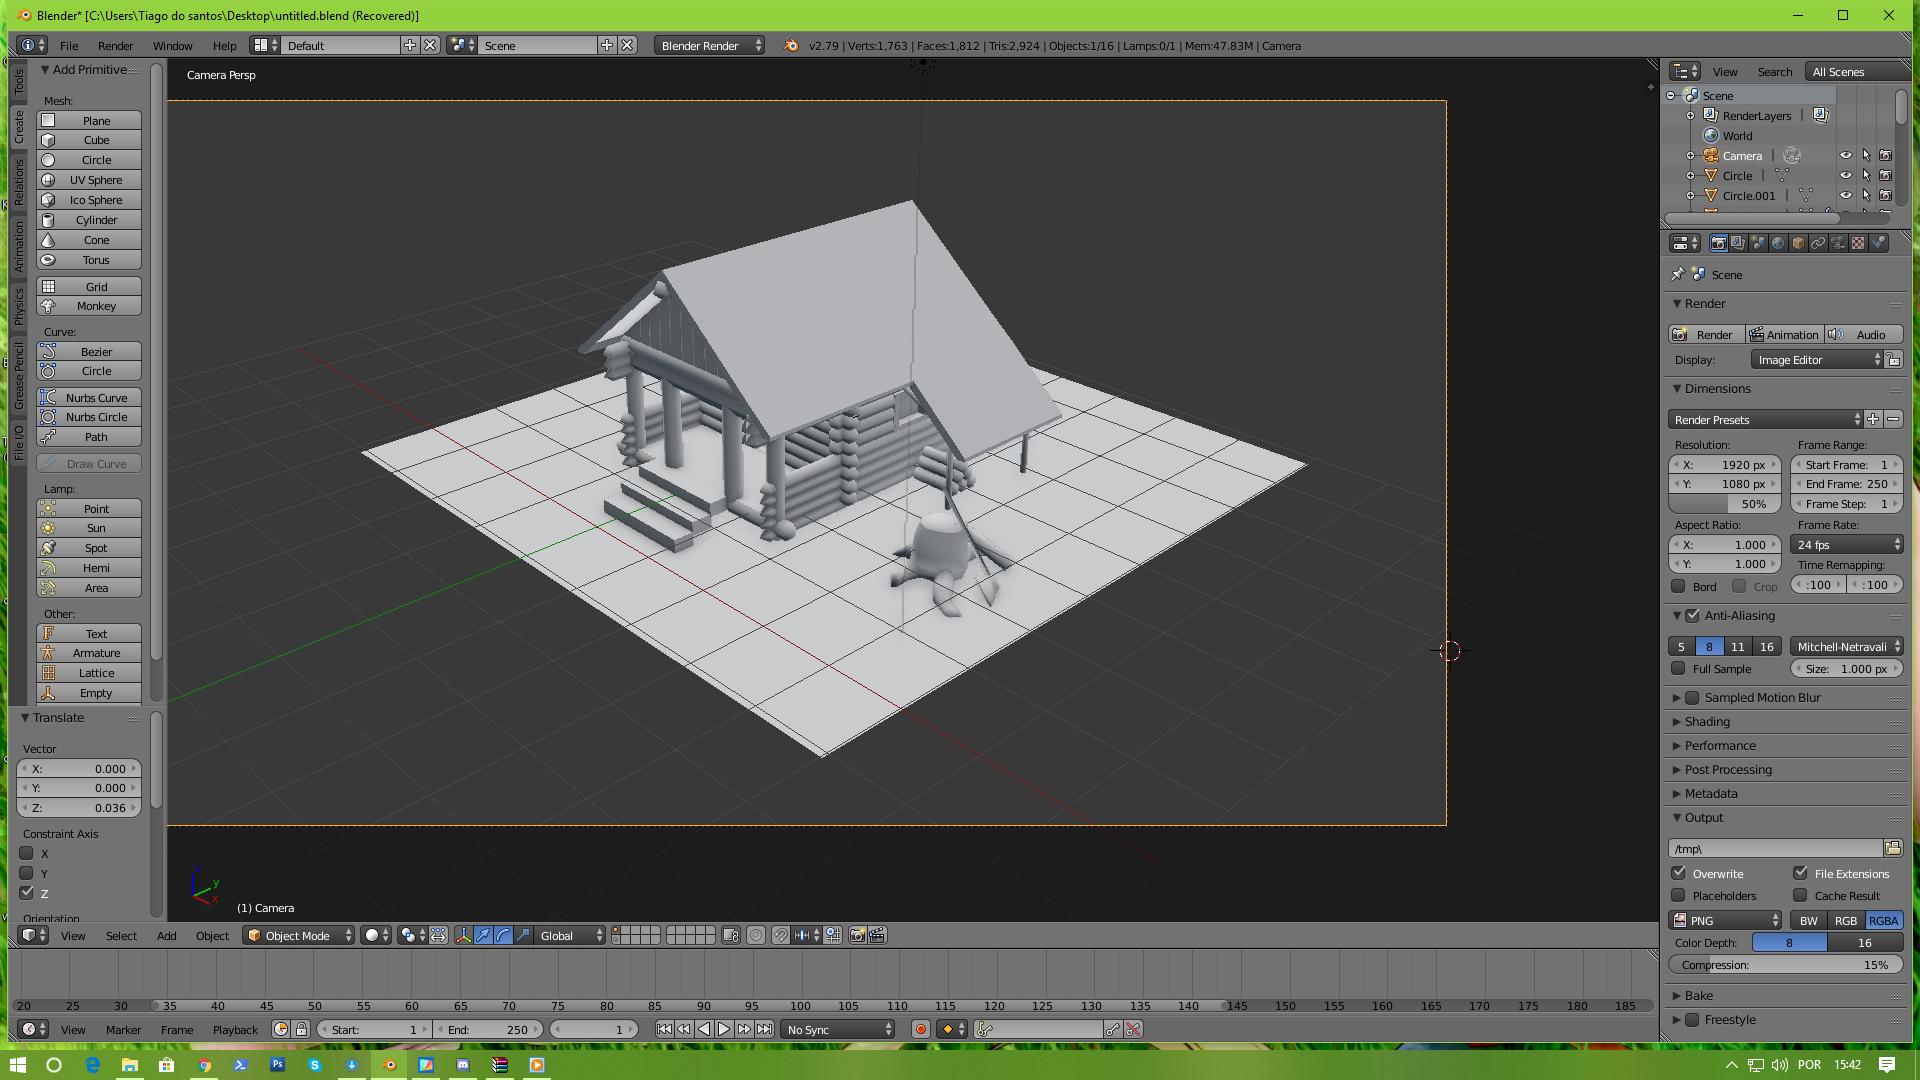 Procuro Programador para jogo baseado em Harvest Moon - Unity (3D) Unknown